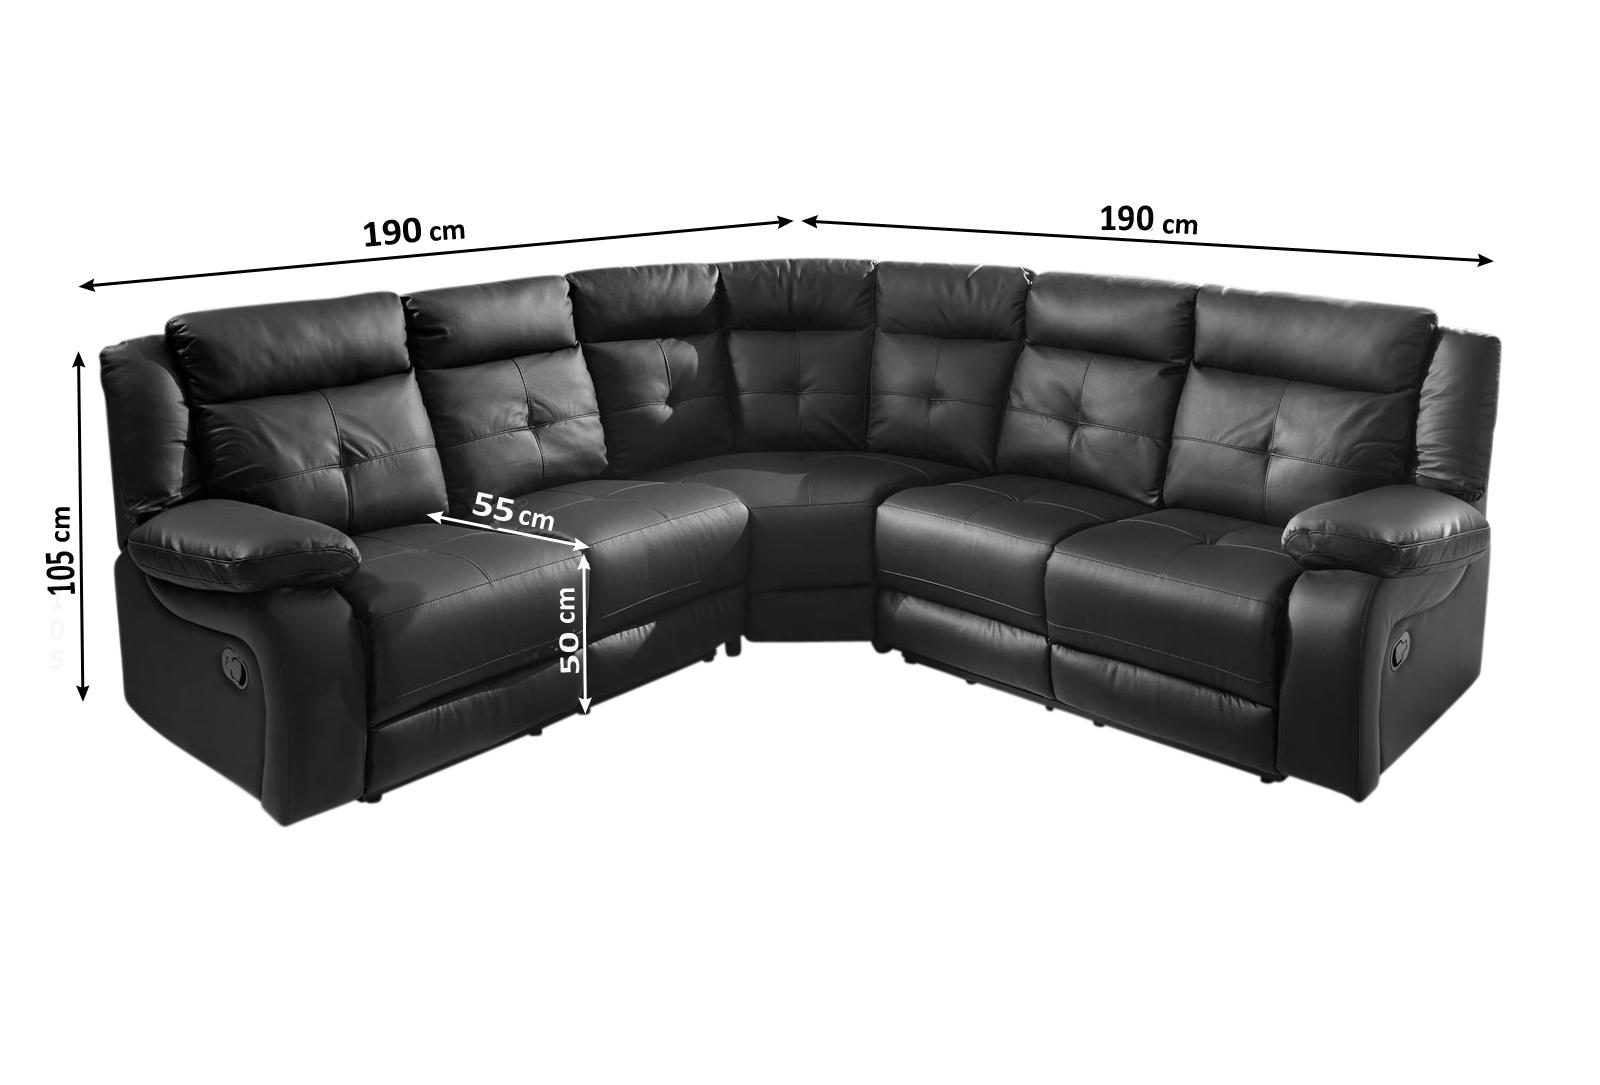 sale ecksofa wohnlandschaft relaxsessel 190 cm schwarz alessio. Black Bedroom Furniture Sets. Home Design Ideas